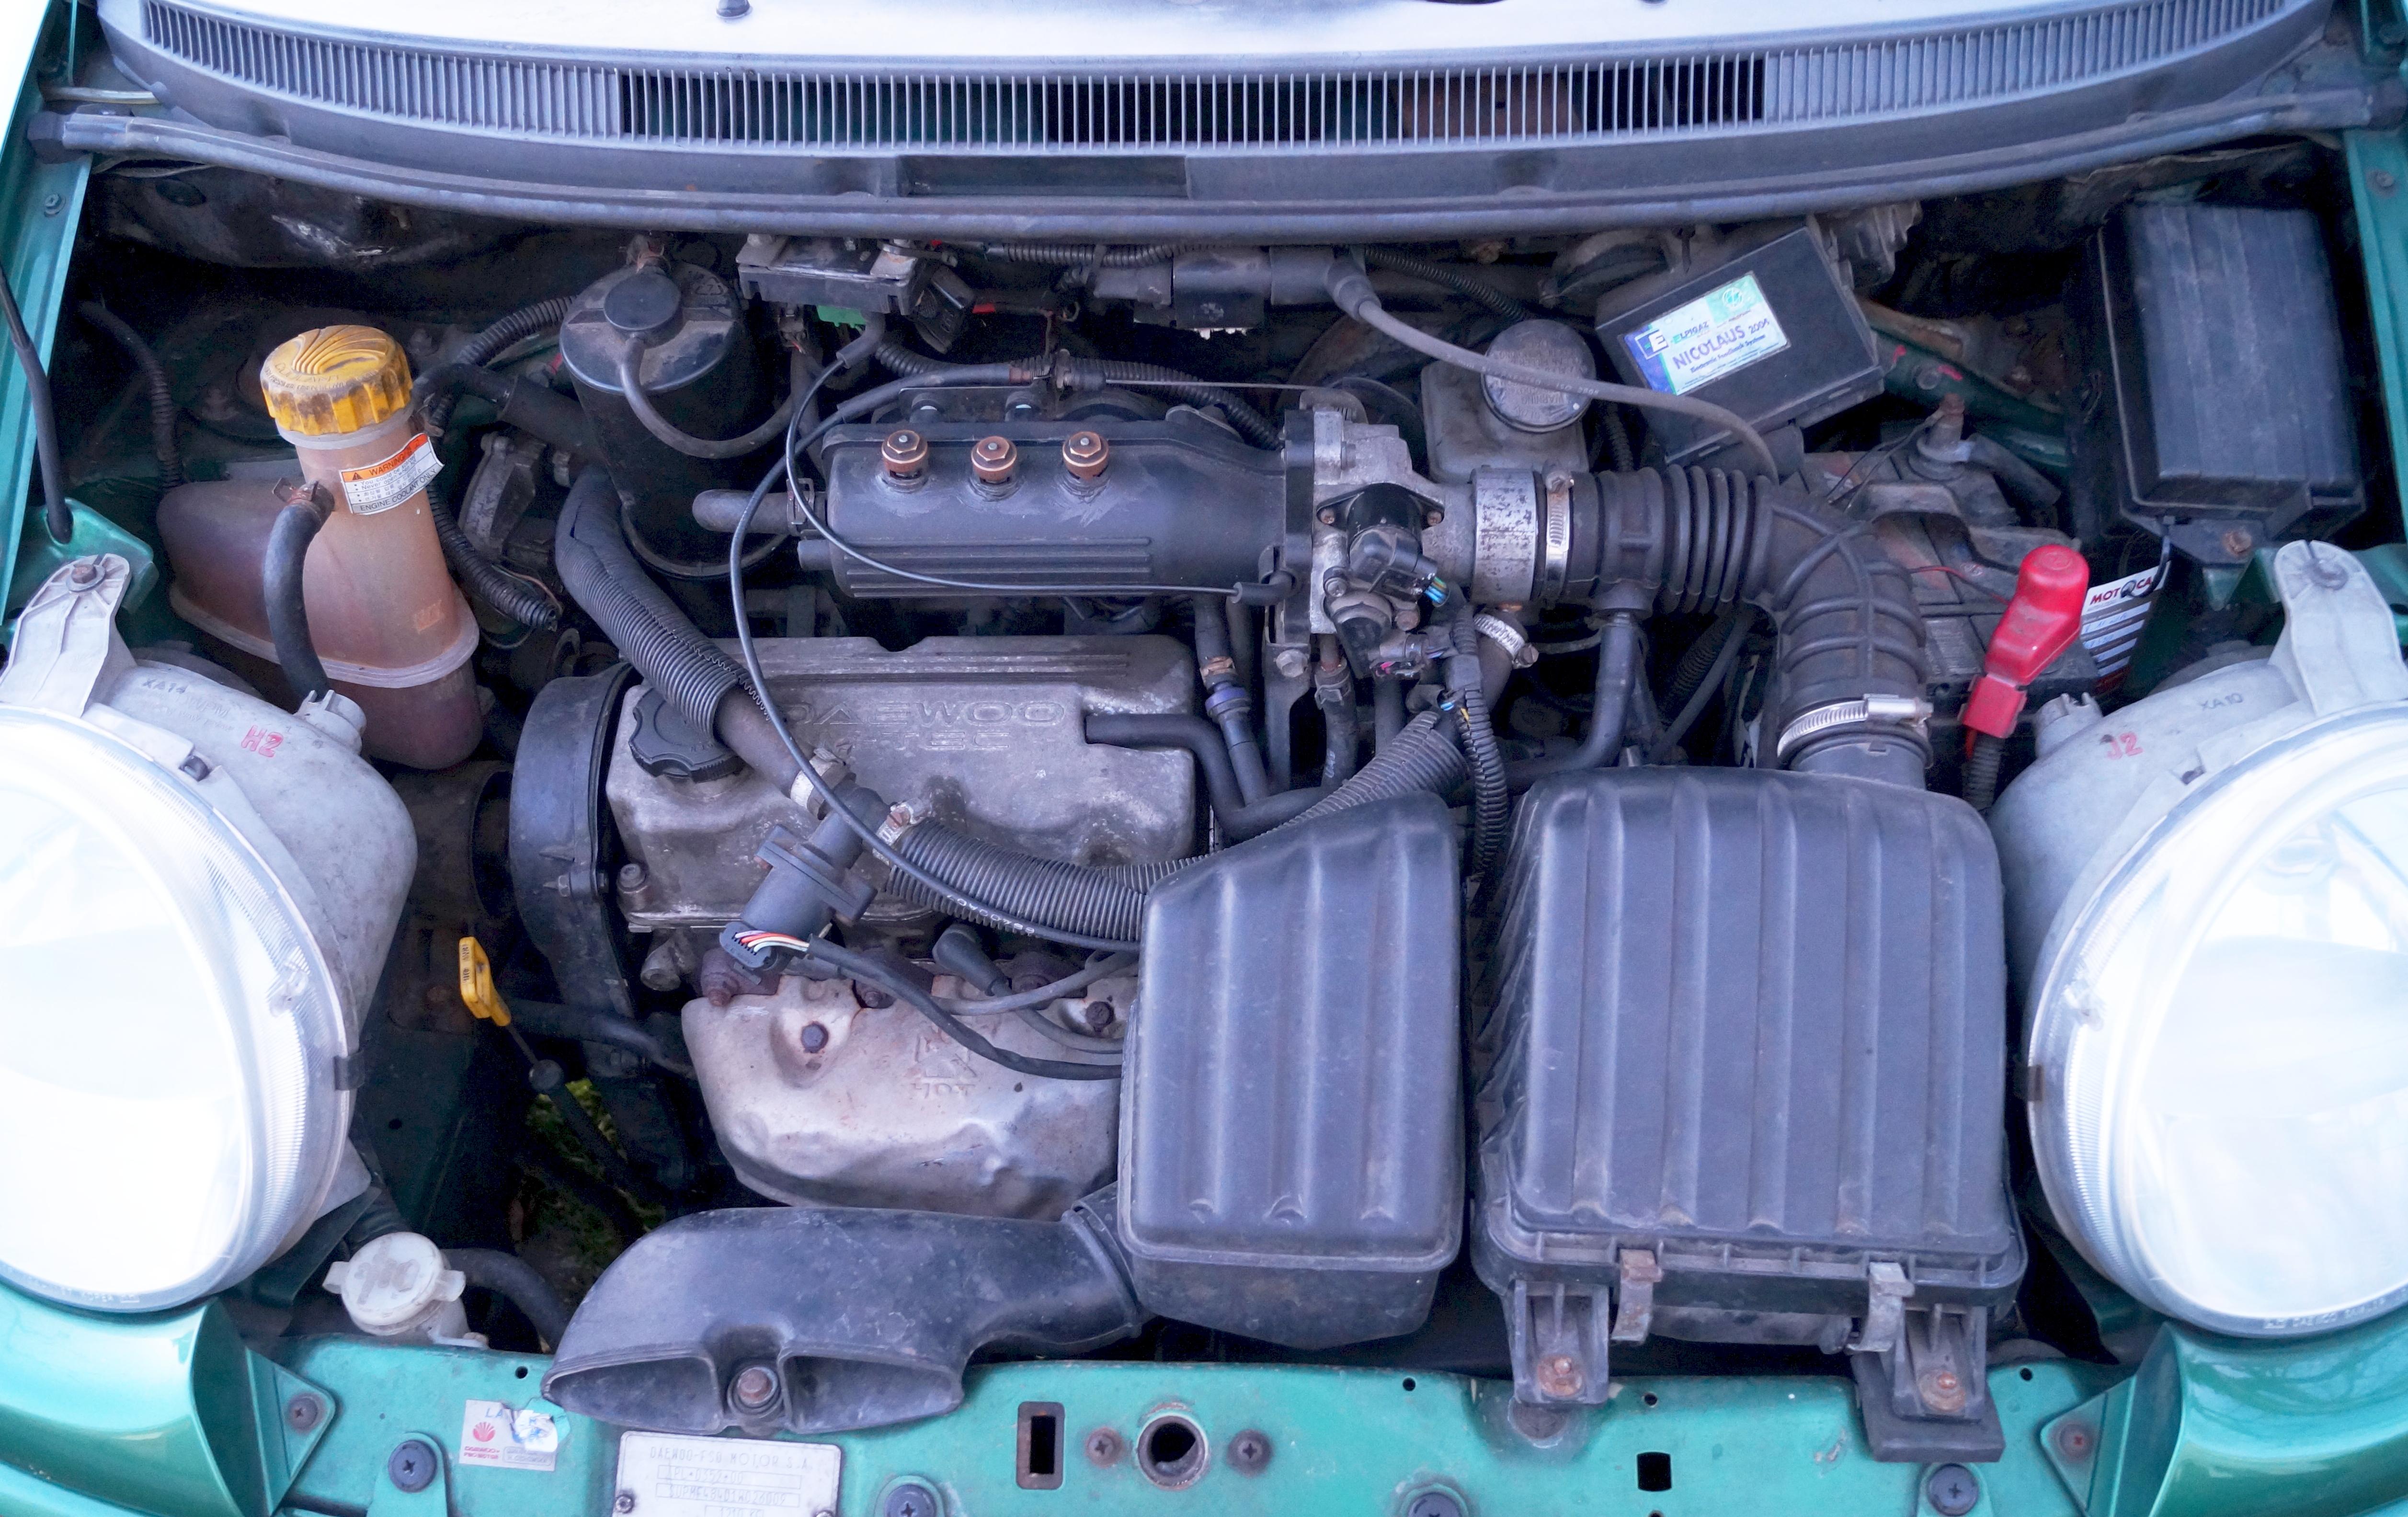 File:Silnik M-Tec 0,8 l, Daewoo Matiz LPG.JPG - Wikimedia Commons